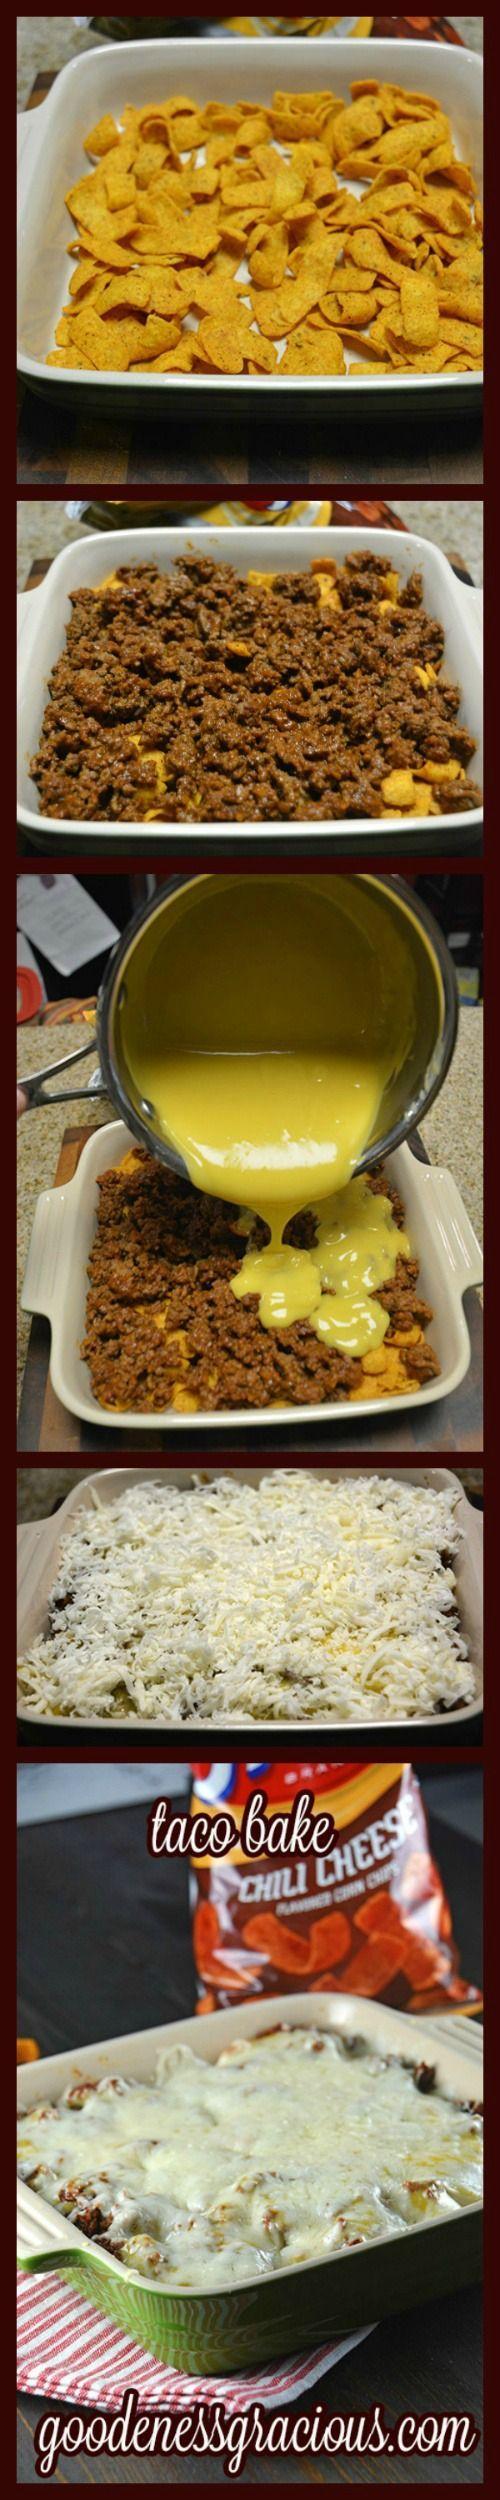 Easy Taco Bake ~ Great taco bake recipe from Gooseberry Patch's Foolproof Family Recipes.